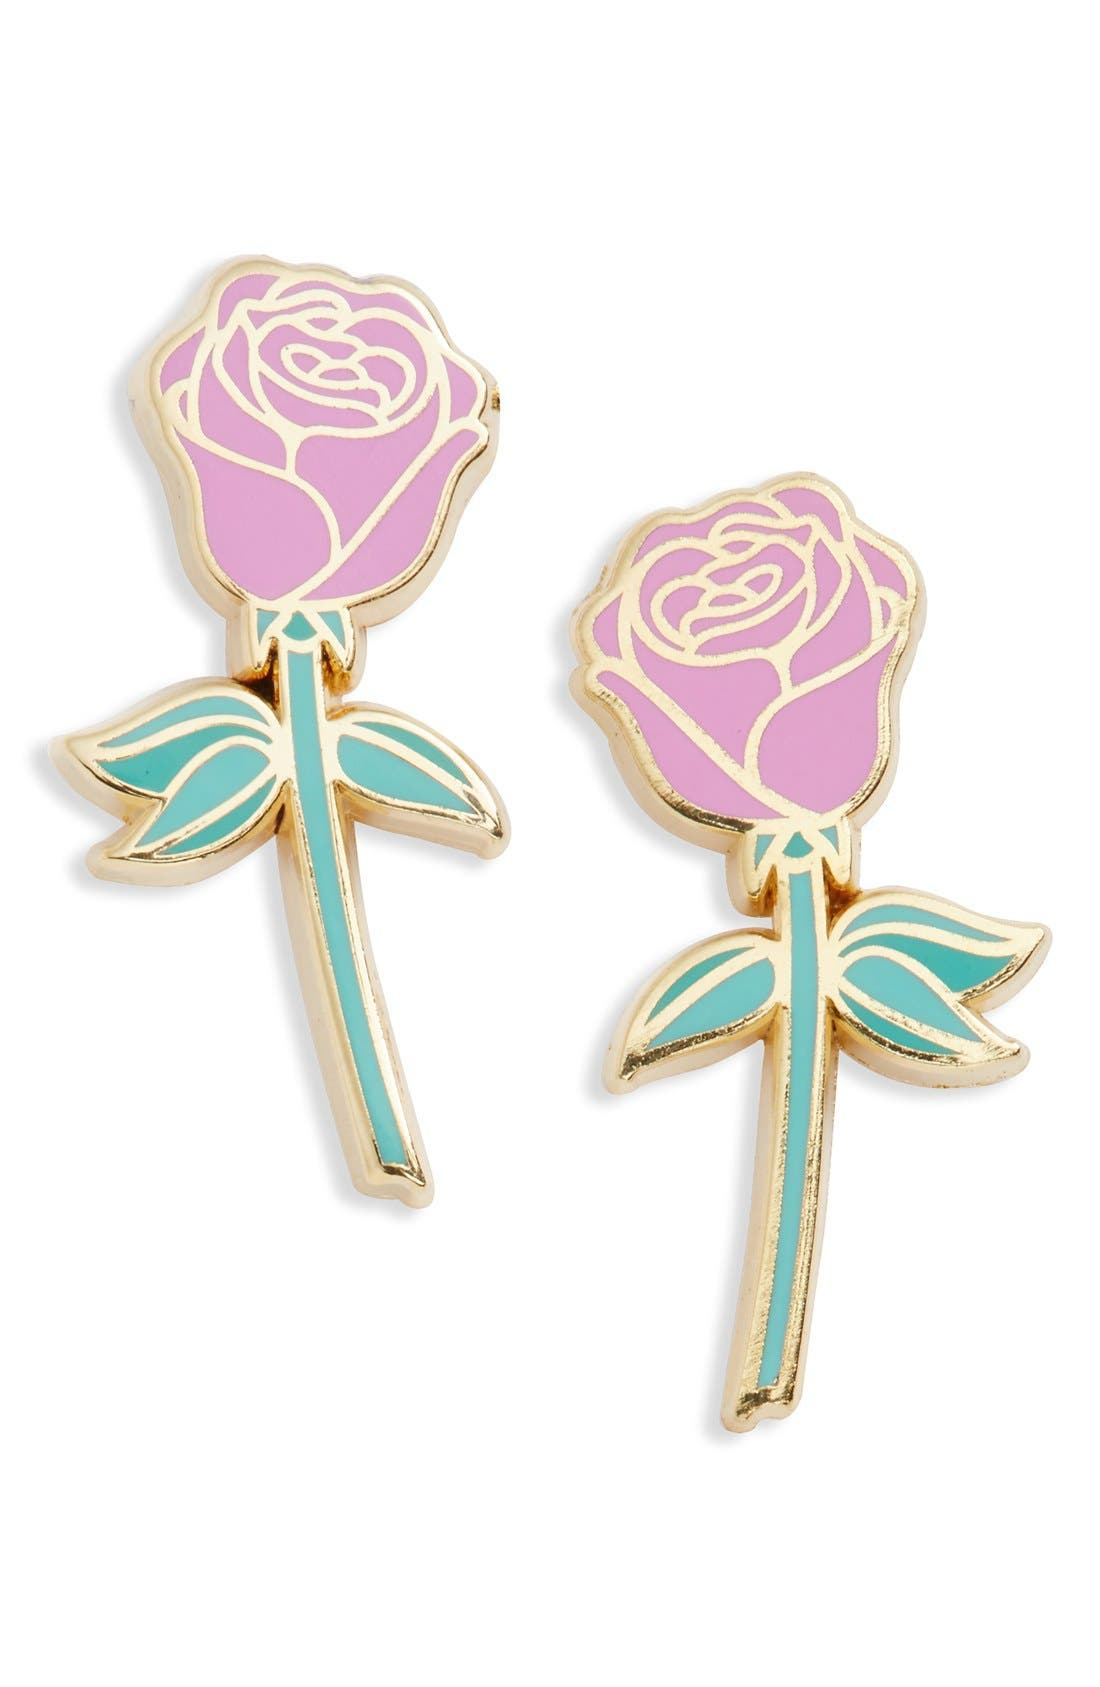 Main Image - Big Bud Press 'Pink Rose' Pins (Set of 2)